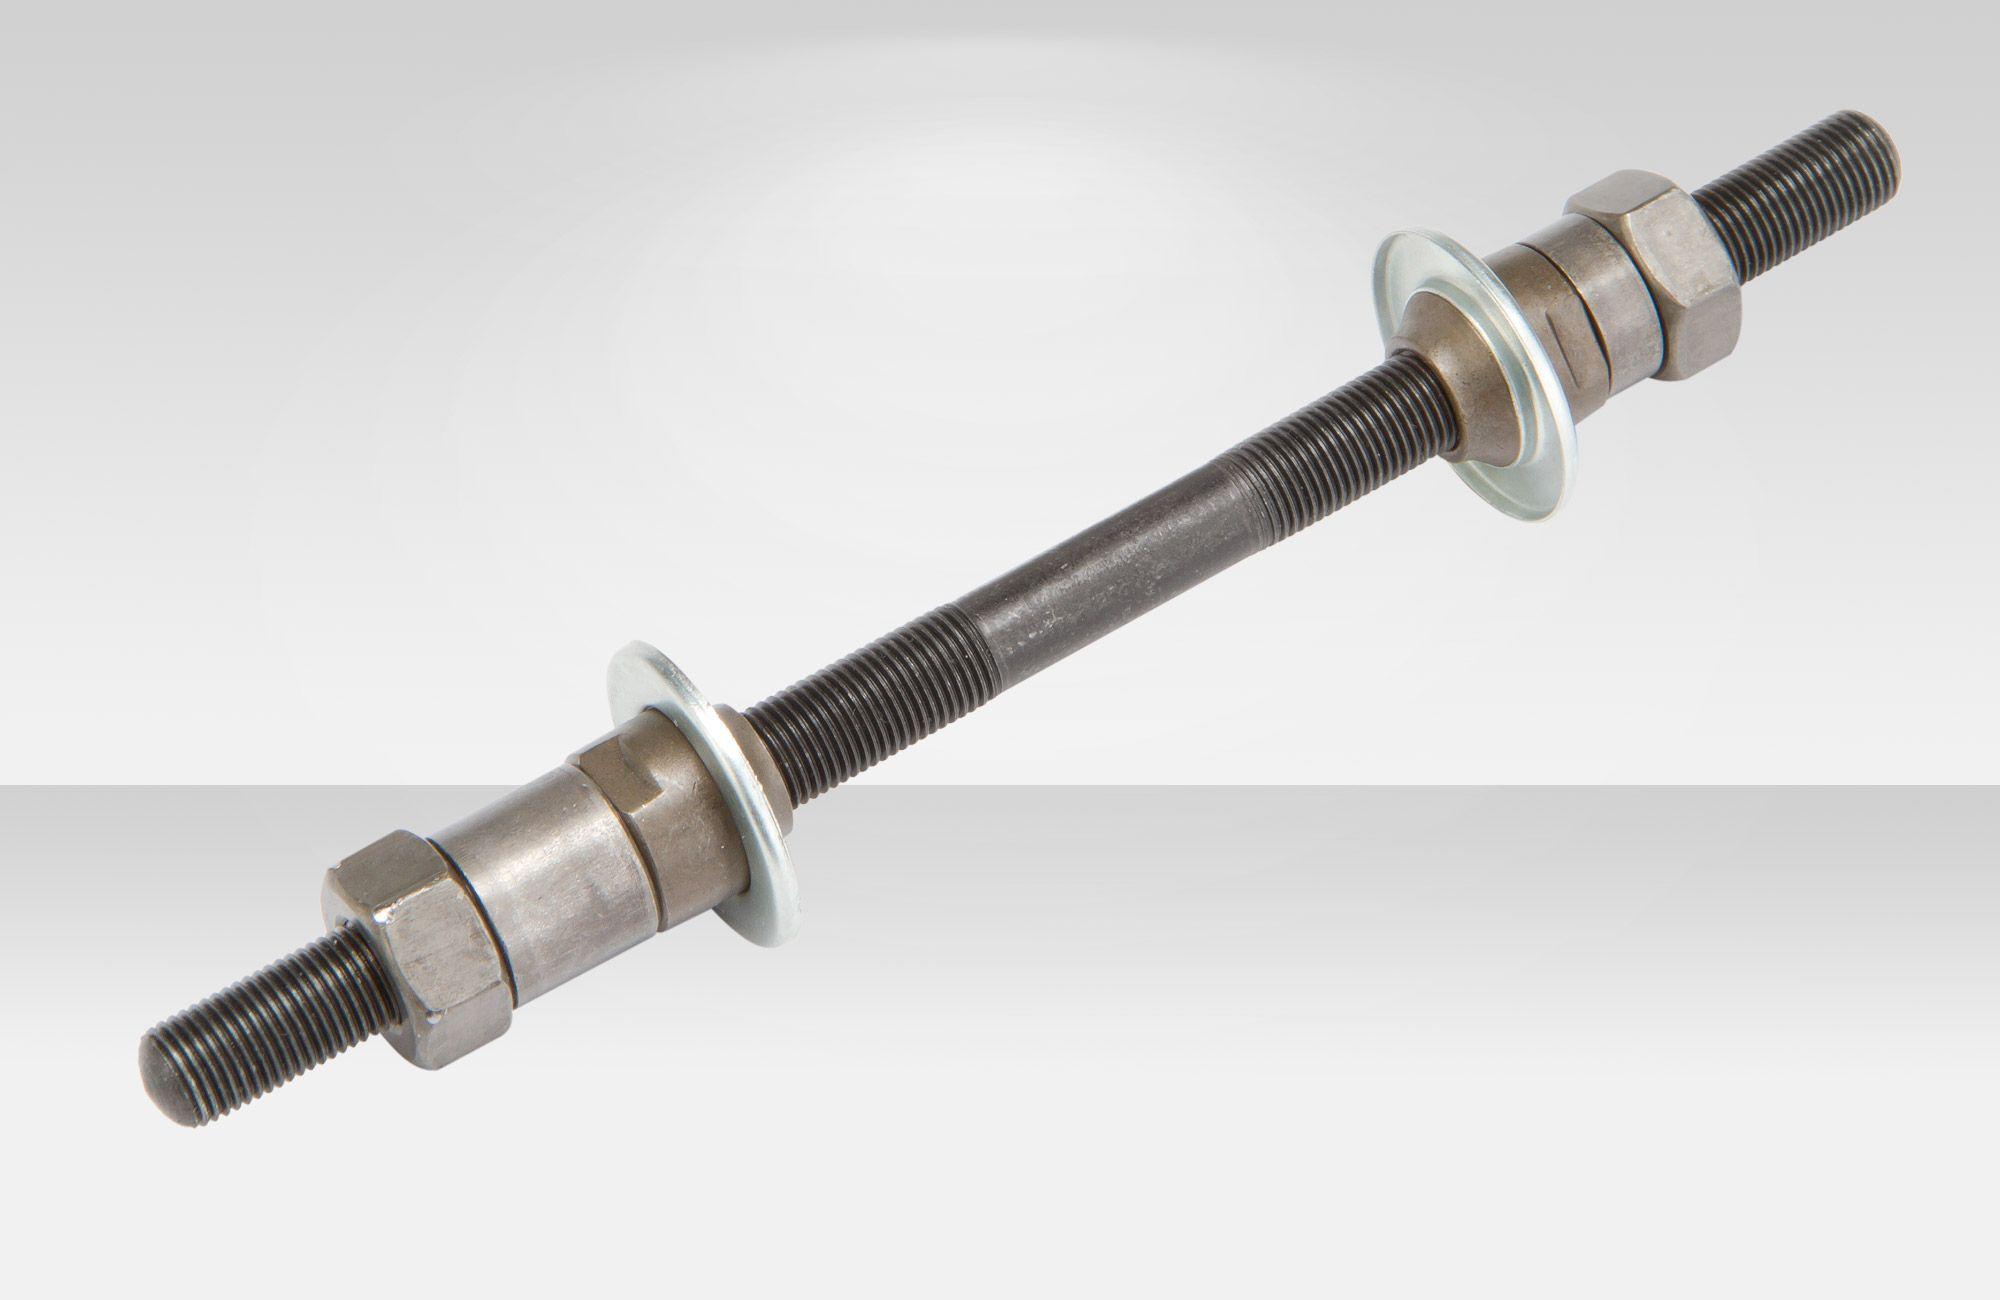 Запчасть Stels ось задней втулки 10 х 175 мм (в комплекте с гайками, шайбами и конусами),  втулки  - артикул:268678